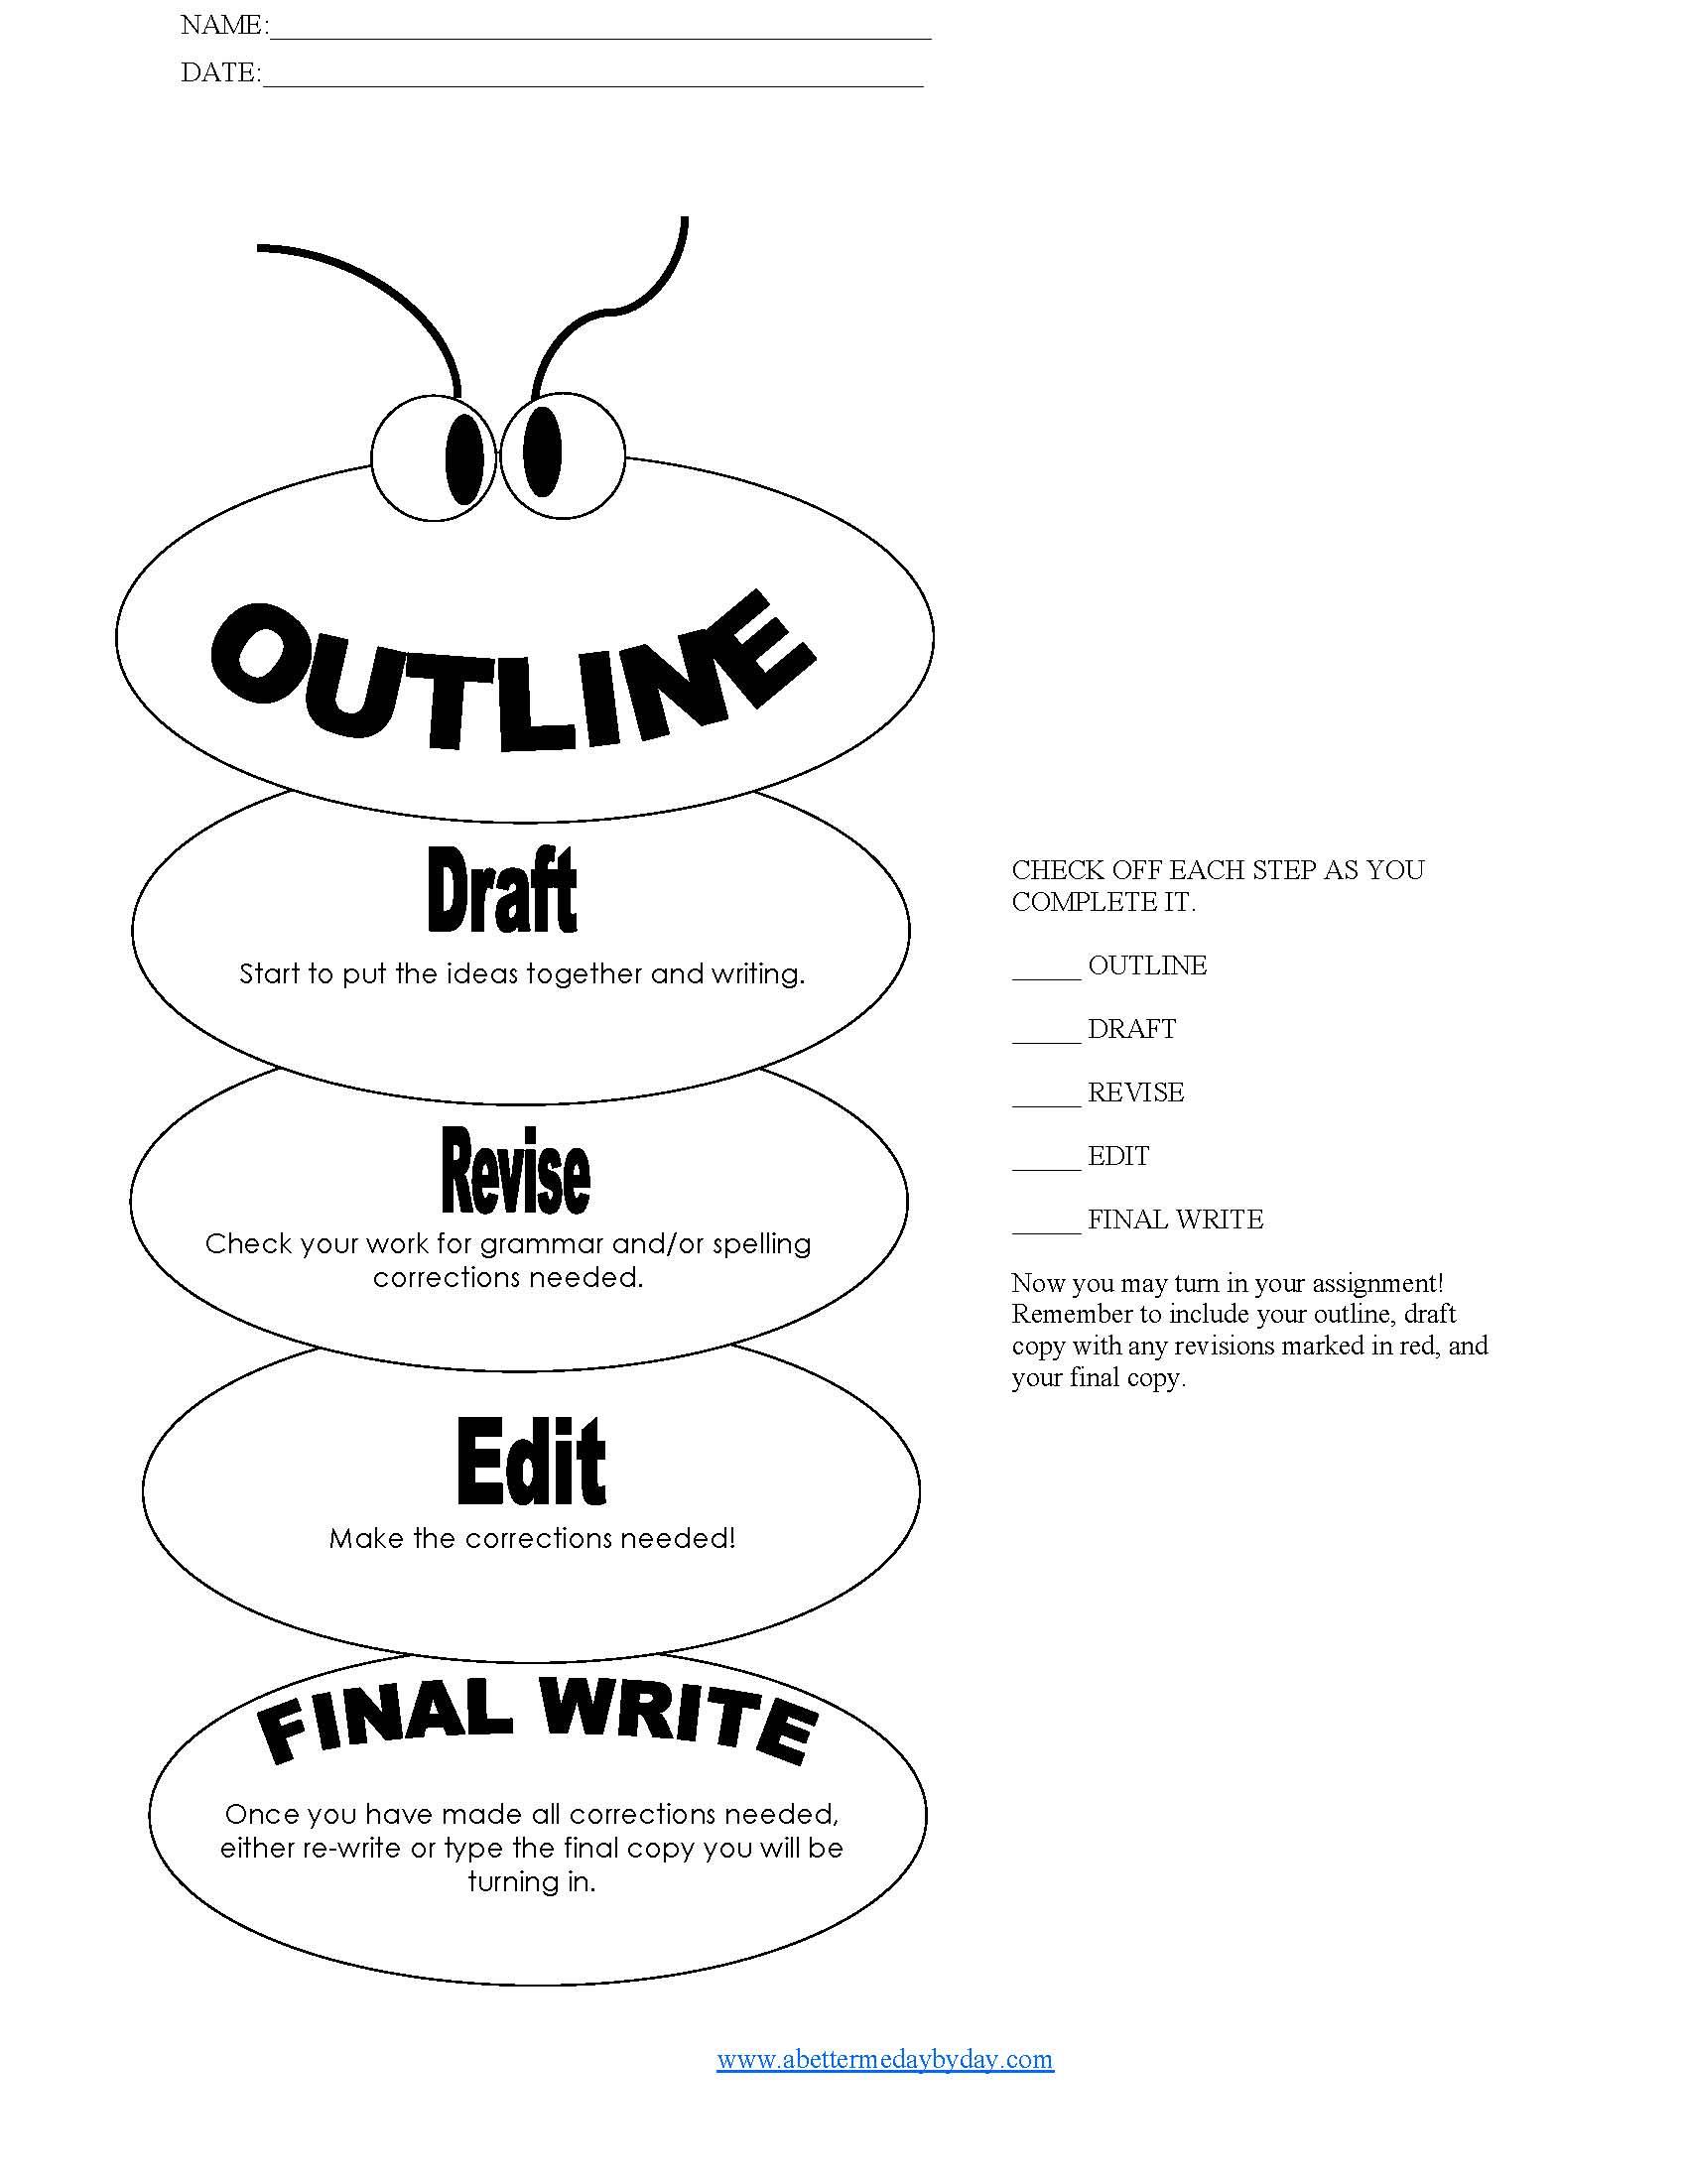 how to write a outline for a essay how to outline an essay writing  writing a outline essay writing outline pdf how to podcast tutorial